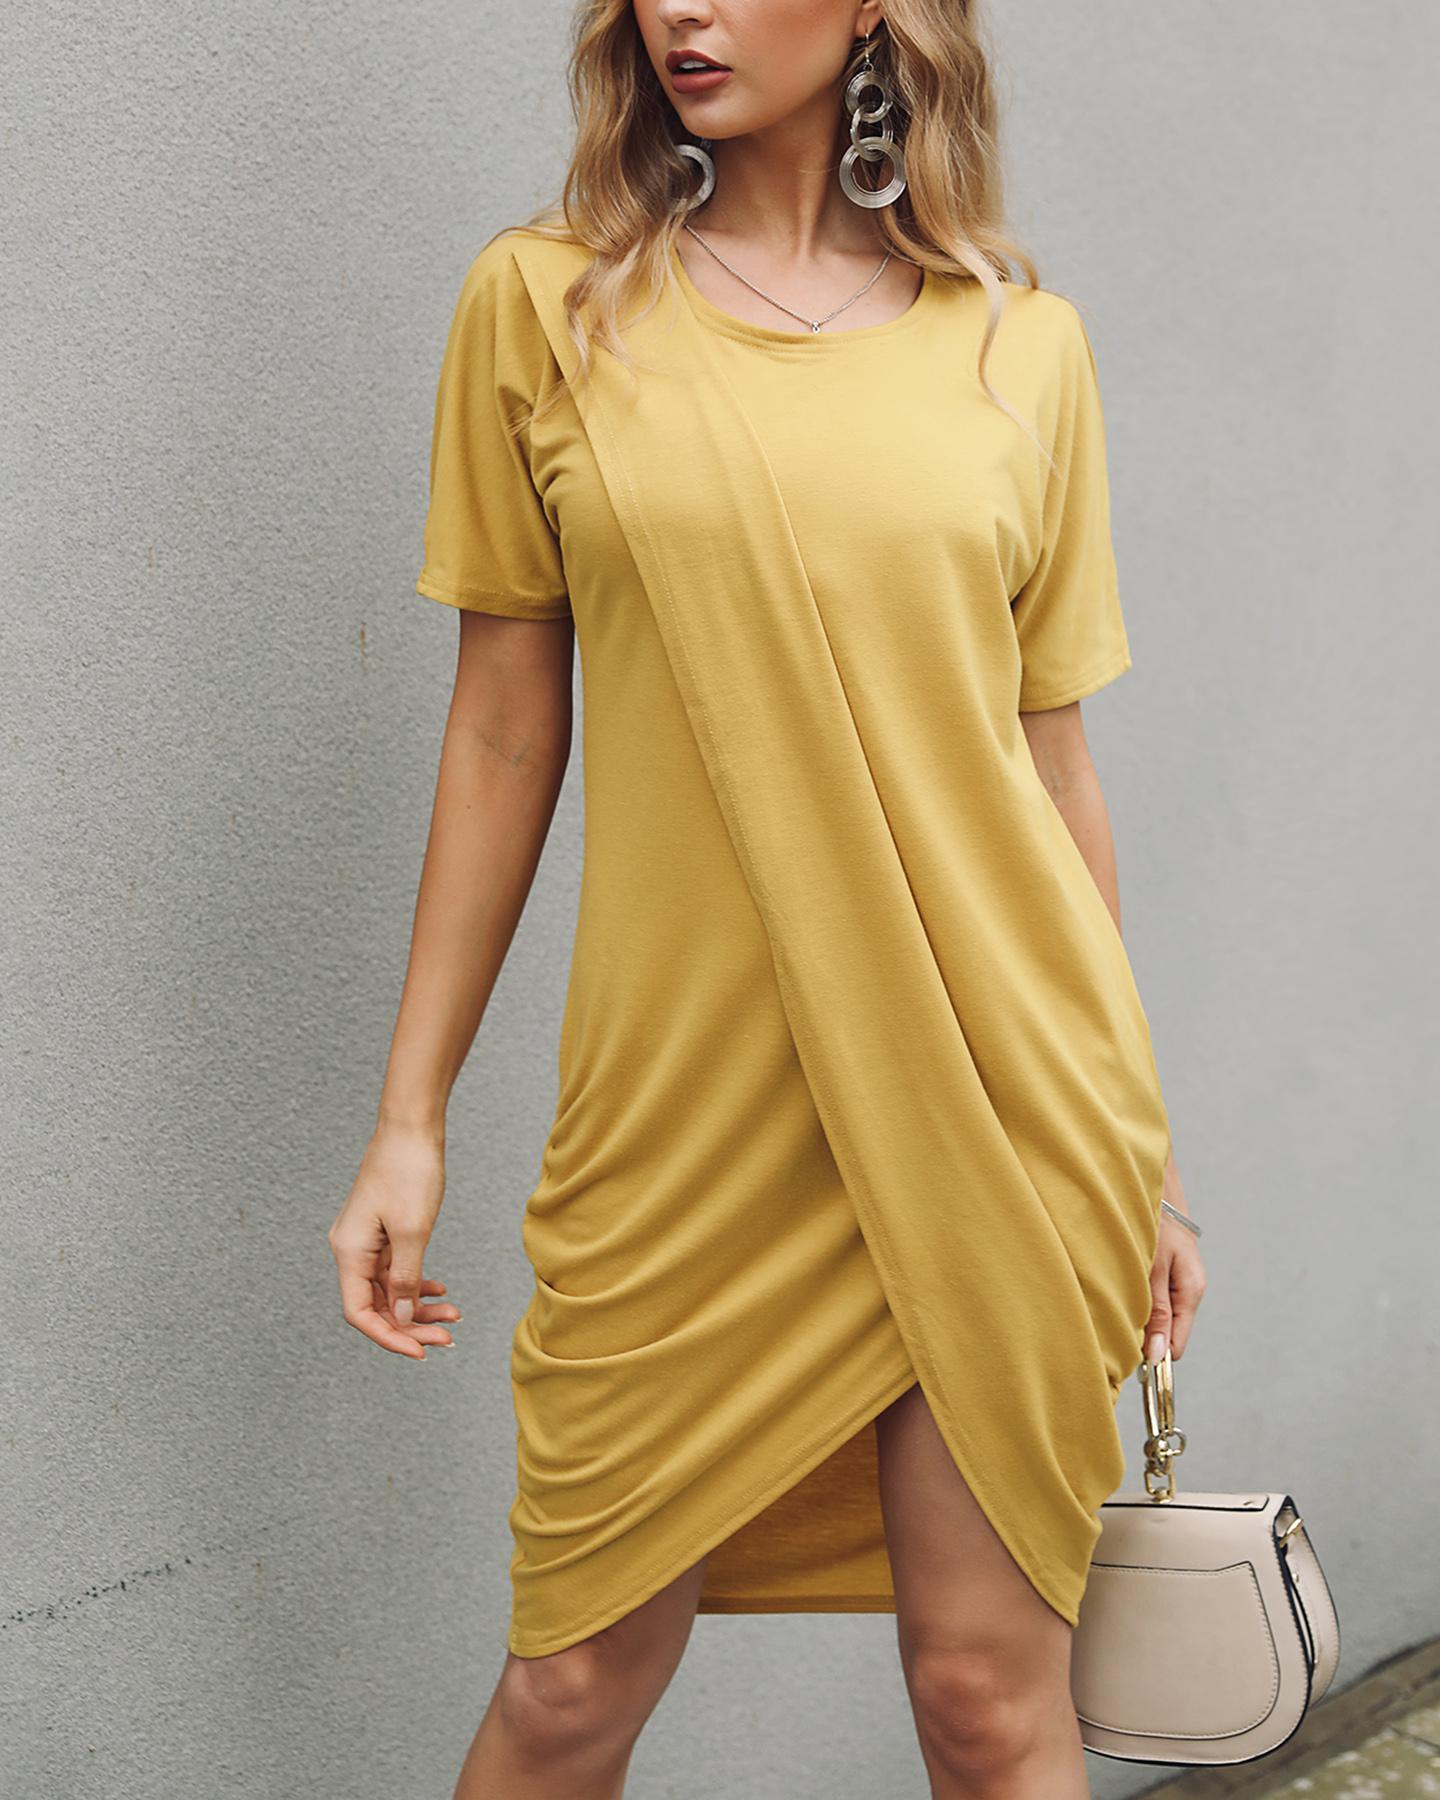 Solid Crisscross Design Irregular Dress фото